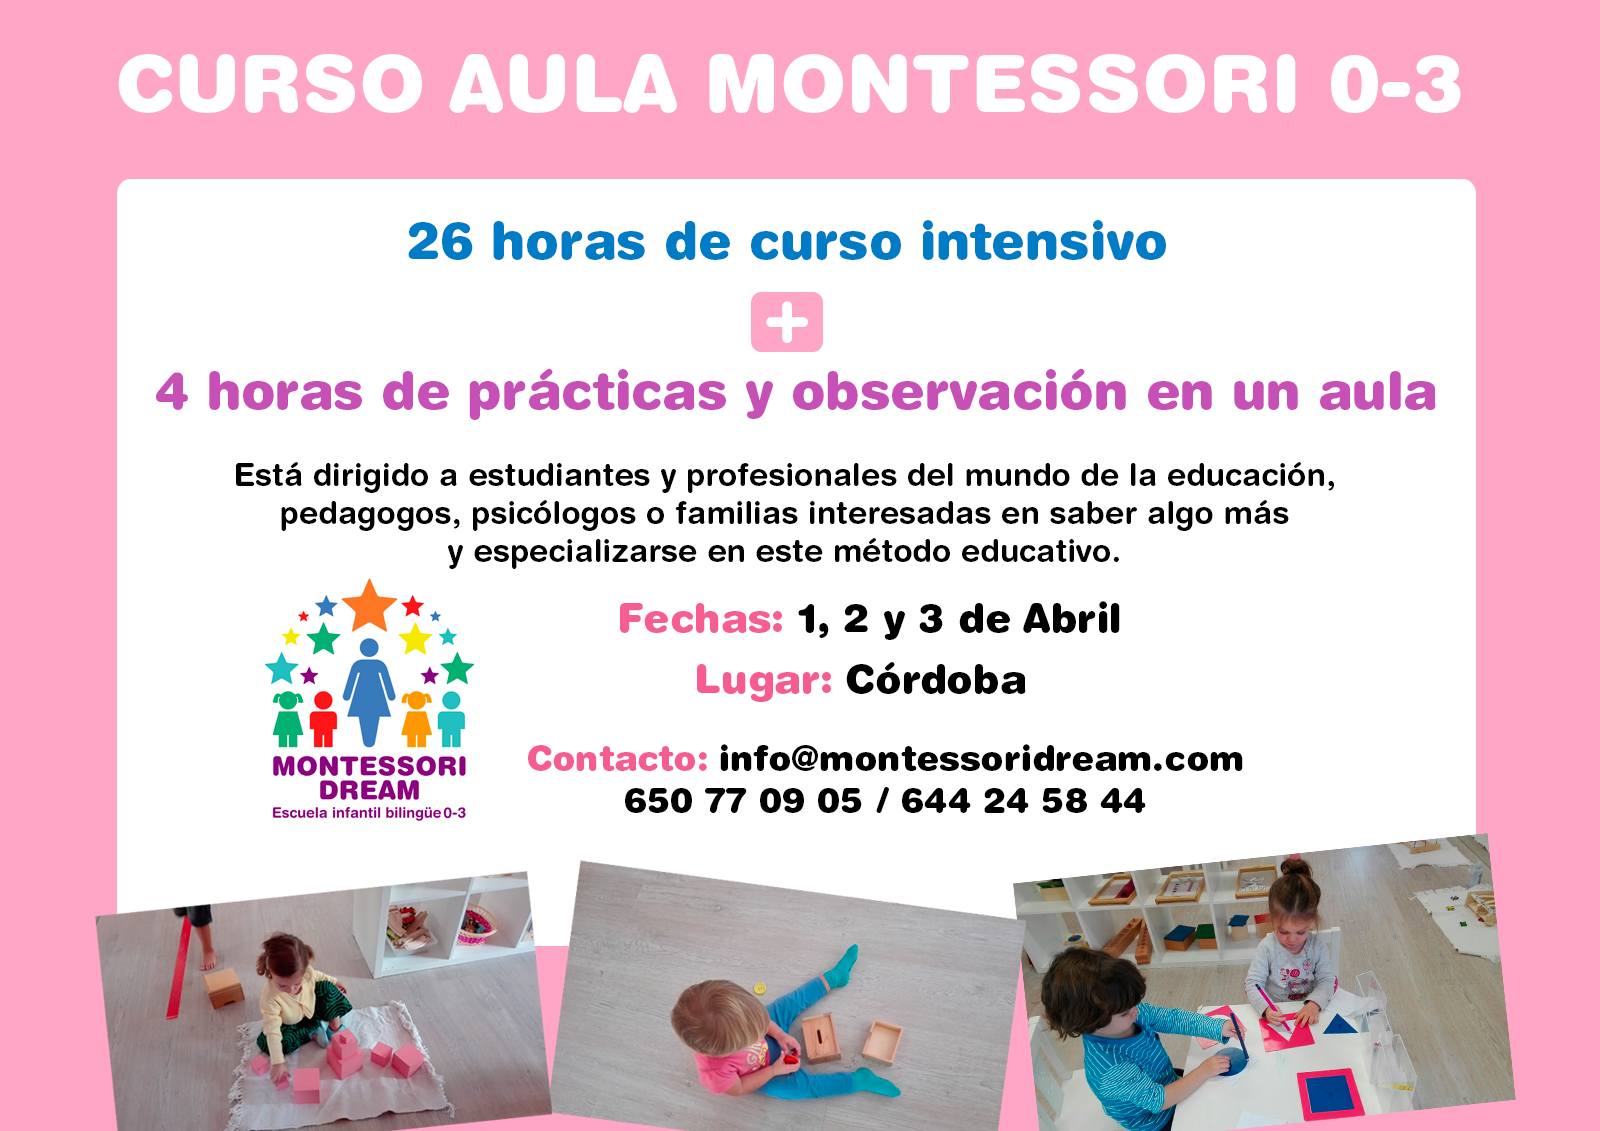 CURSO-AULA-MONTESSORI-0-3